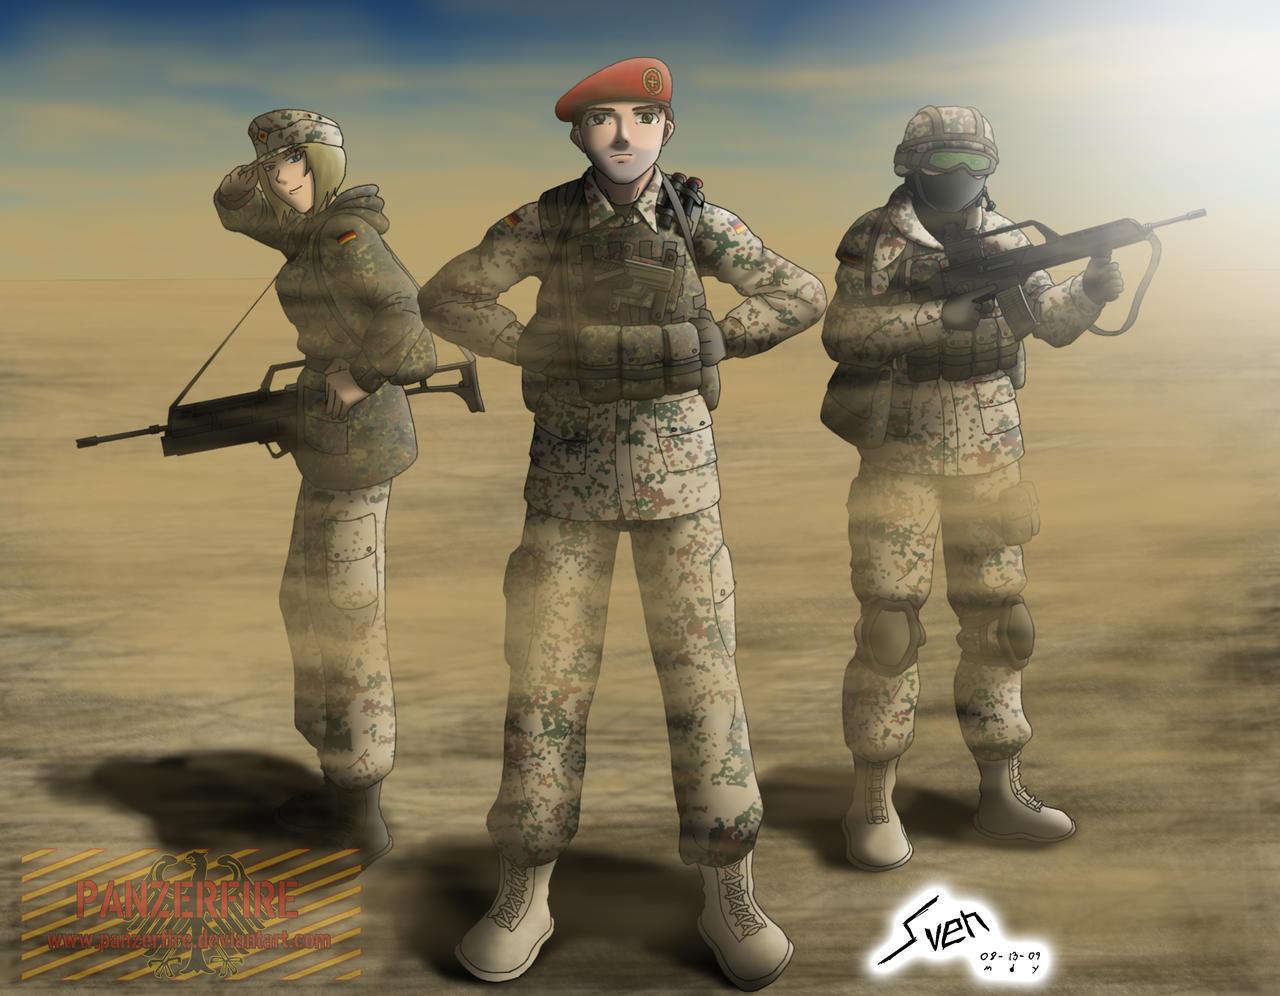 It's 'Ze' Germans by Panzerfire